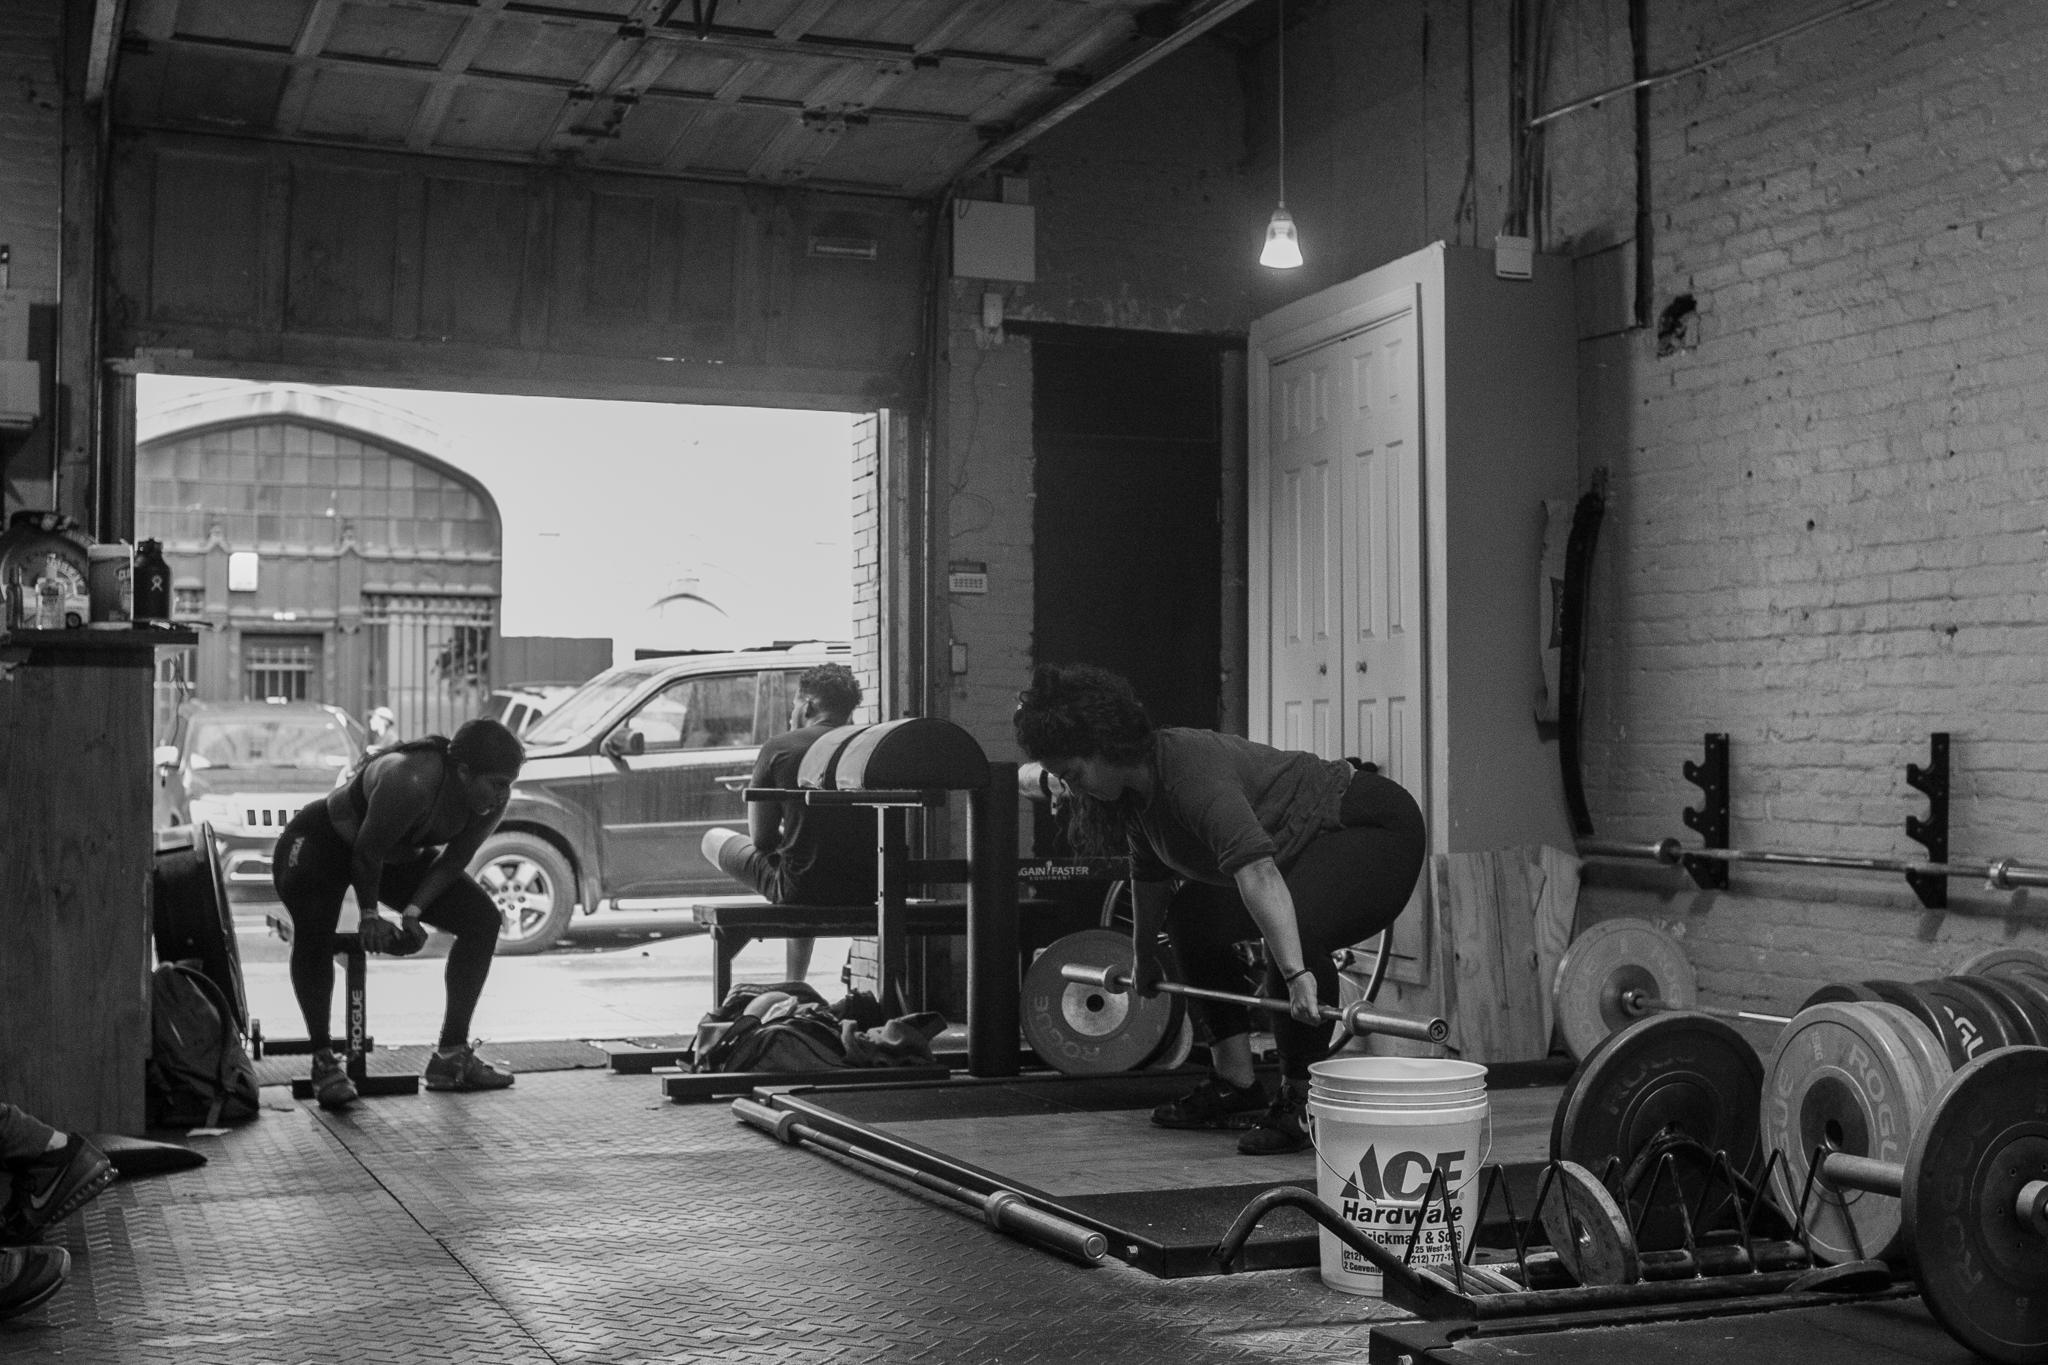 james-wright-visit-brooklyn-new-york-weightlifting-coach-teammates-october-2016 (24 of 92).jpg